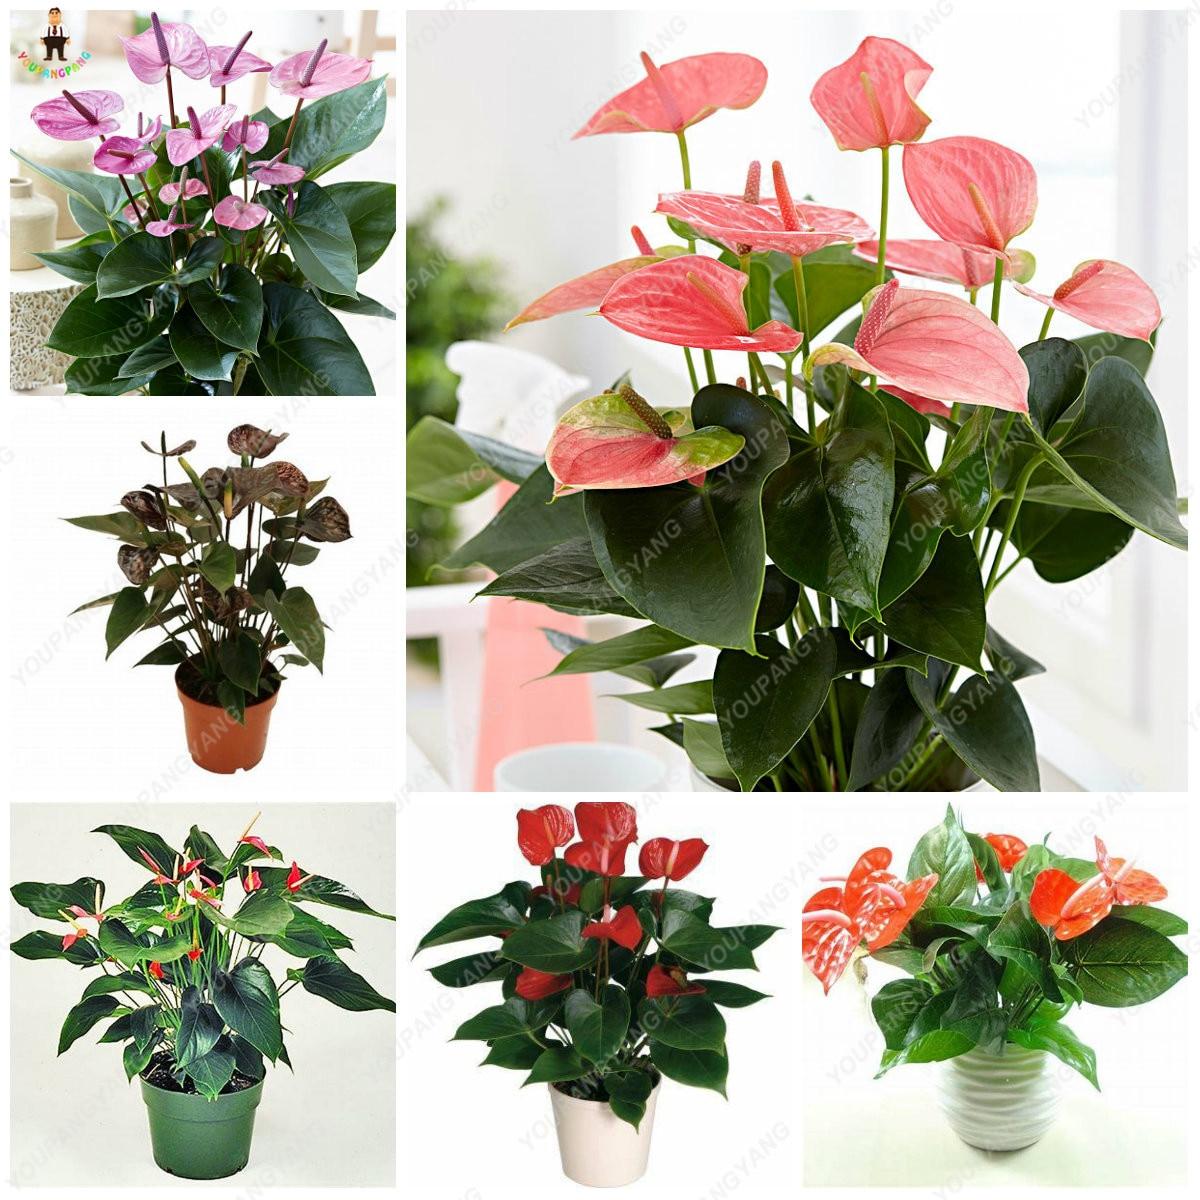 Us 0 88 Hot Sale 50pcs Anthurium Plants Beautiful Rainbow Anthurium Garden Flowers High Survival Rate Bonsai Tree Garden Decoration In Bonsai From